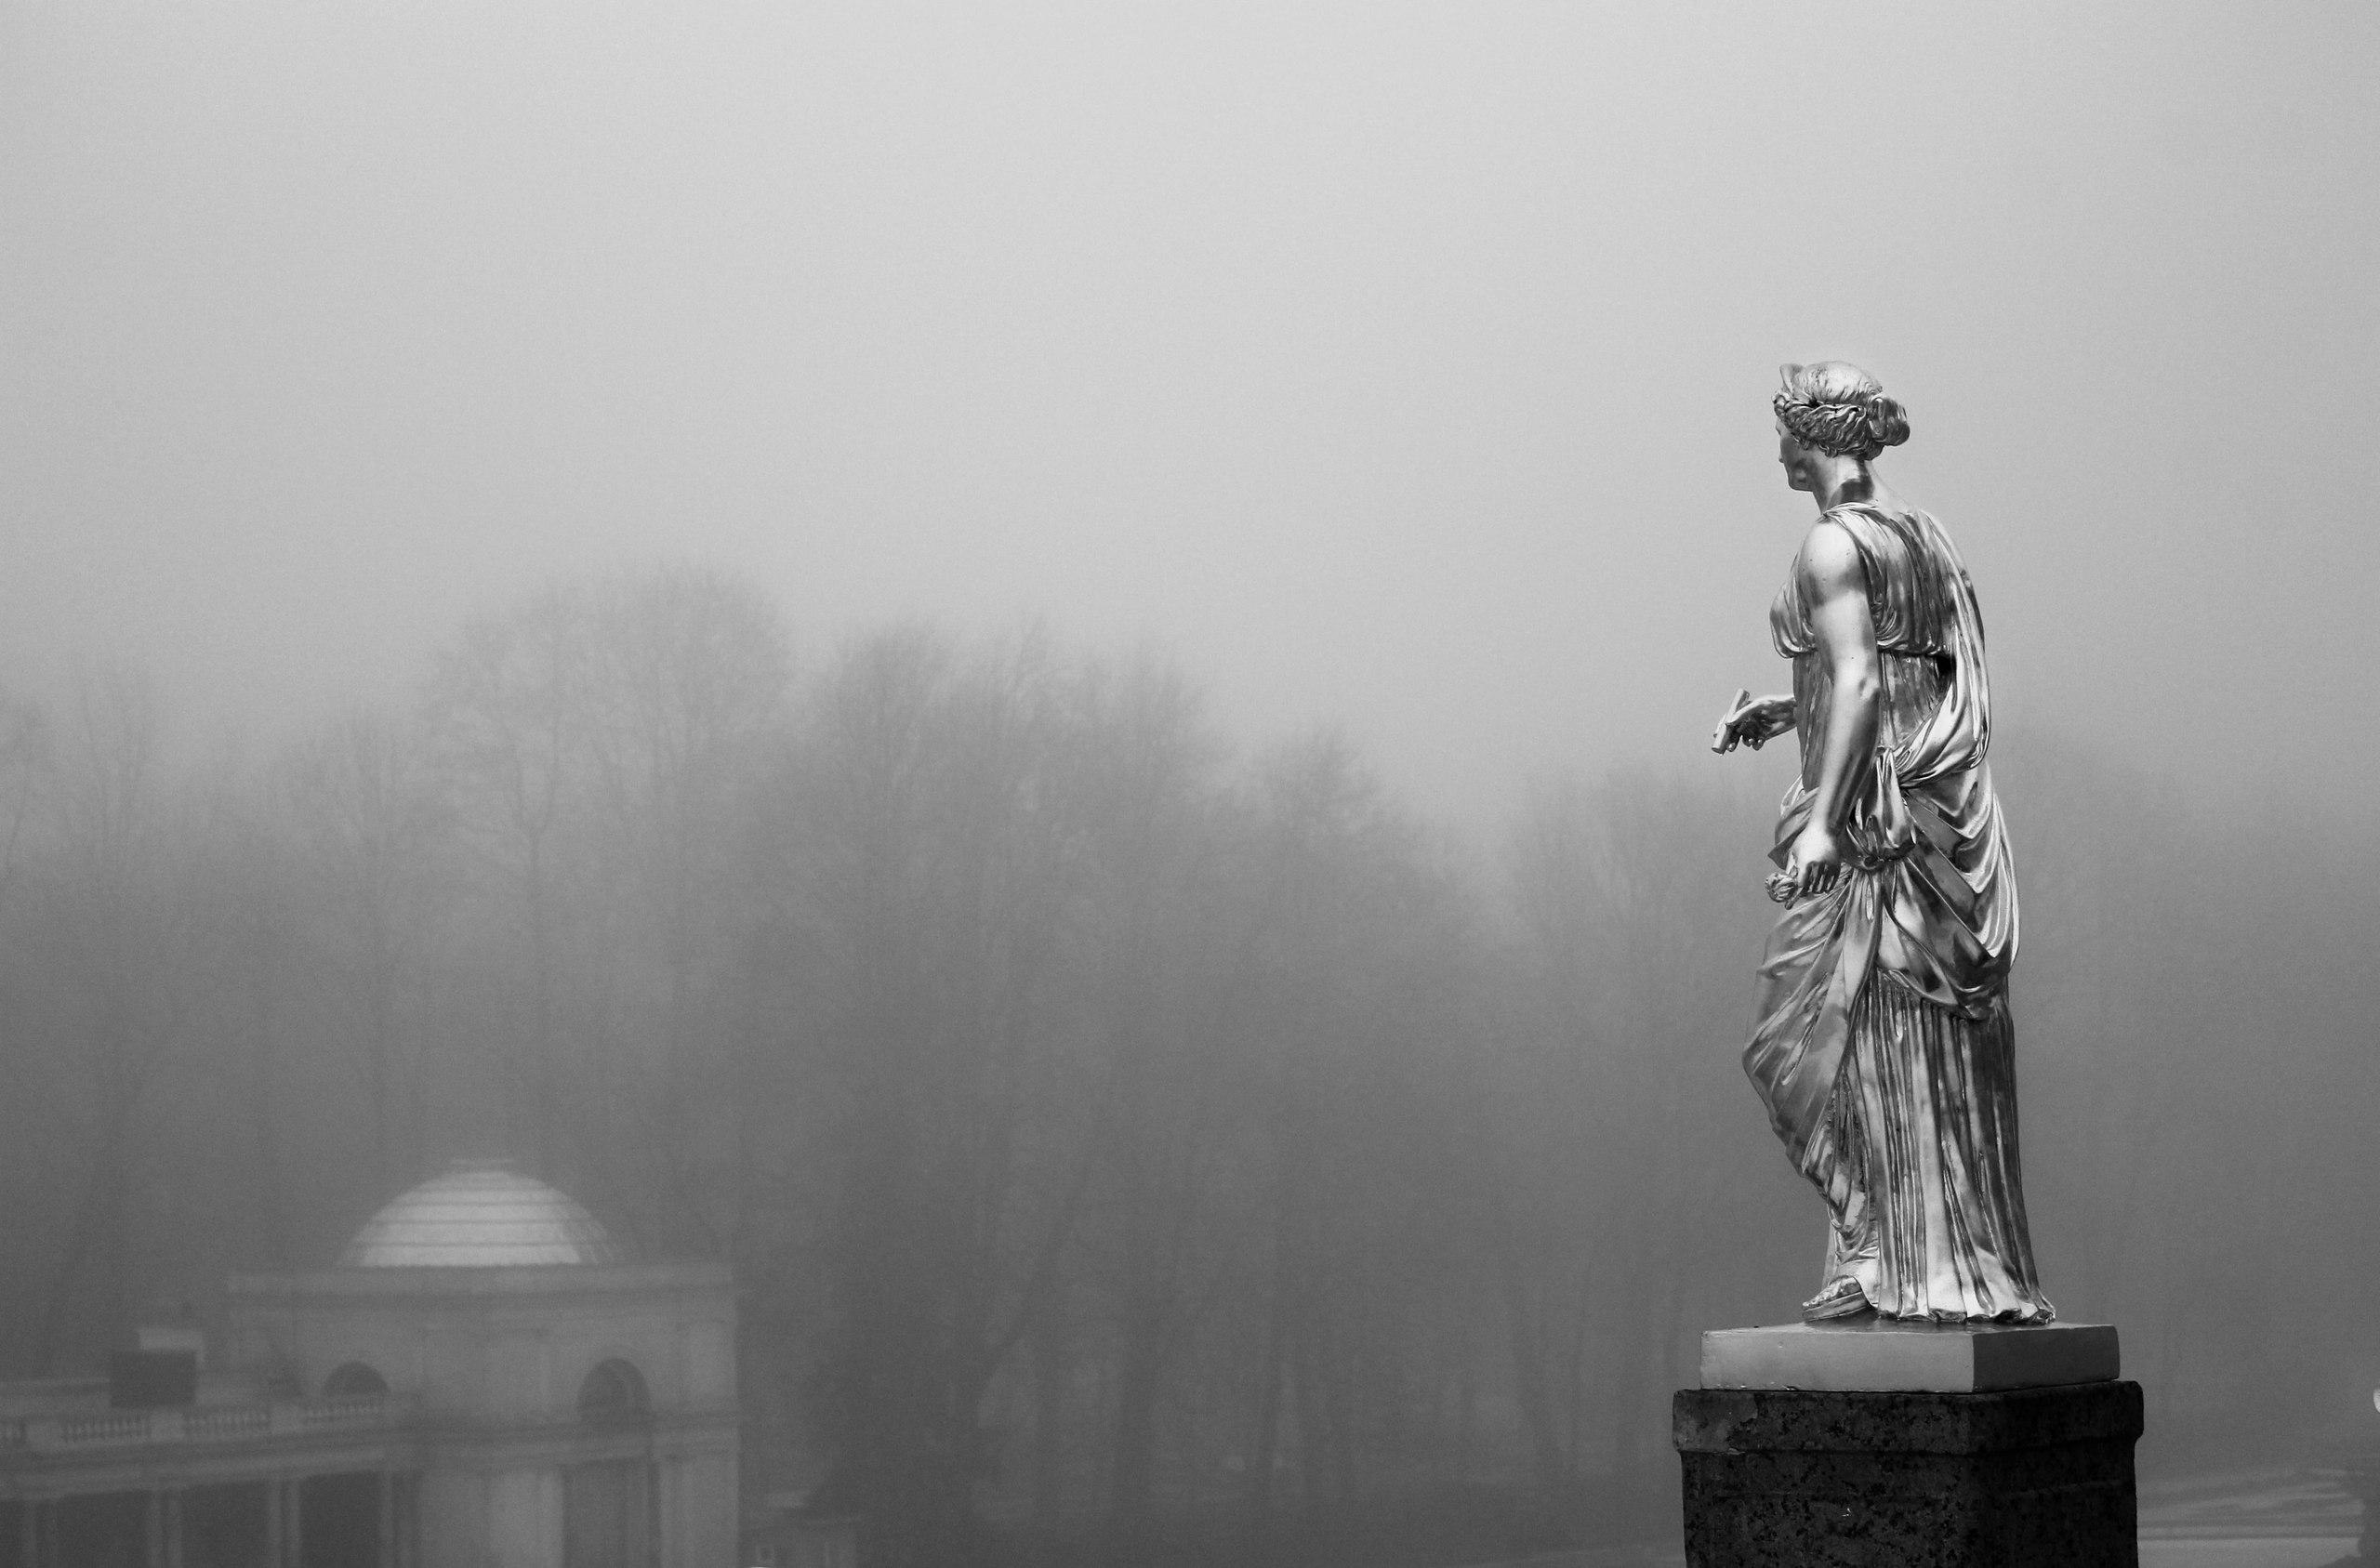 Петергоф, Нижний парк, туман, Воронихинская галерея, Большой каскад